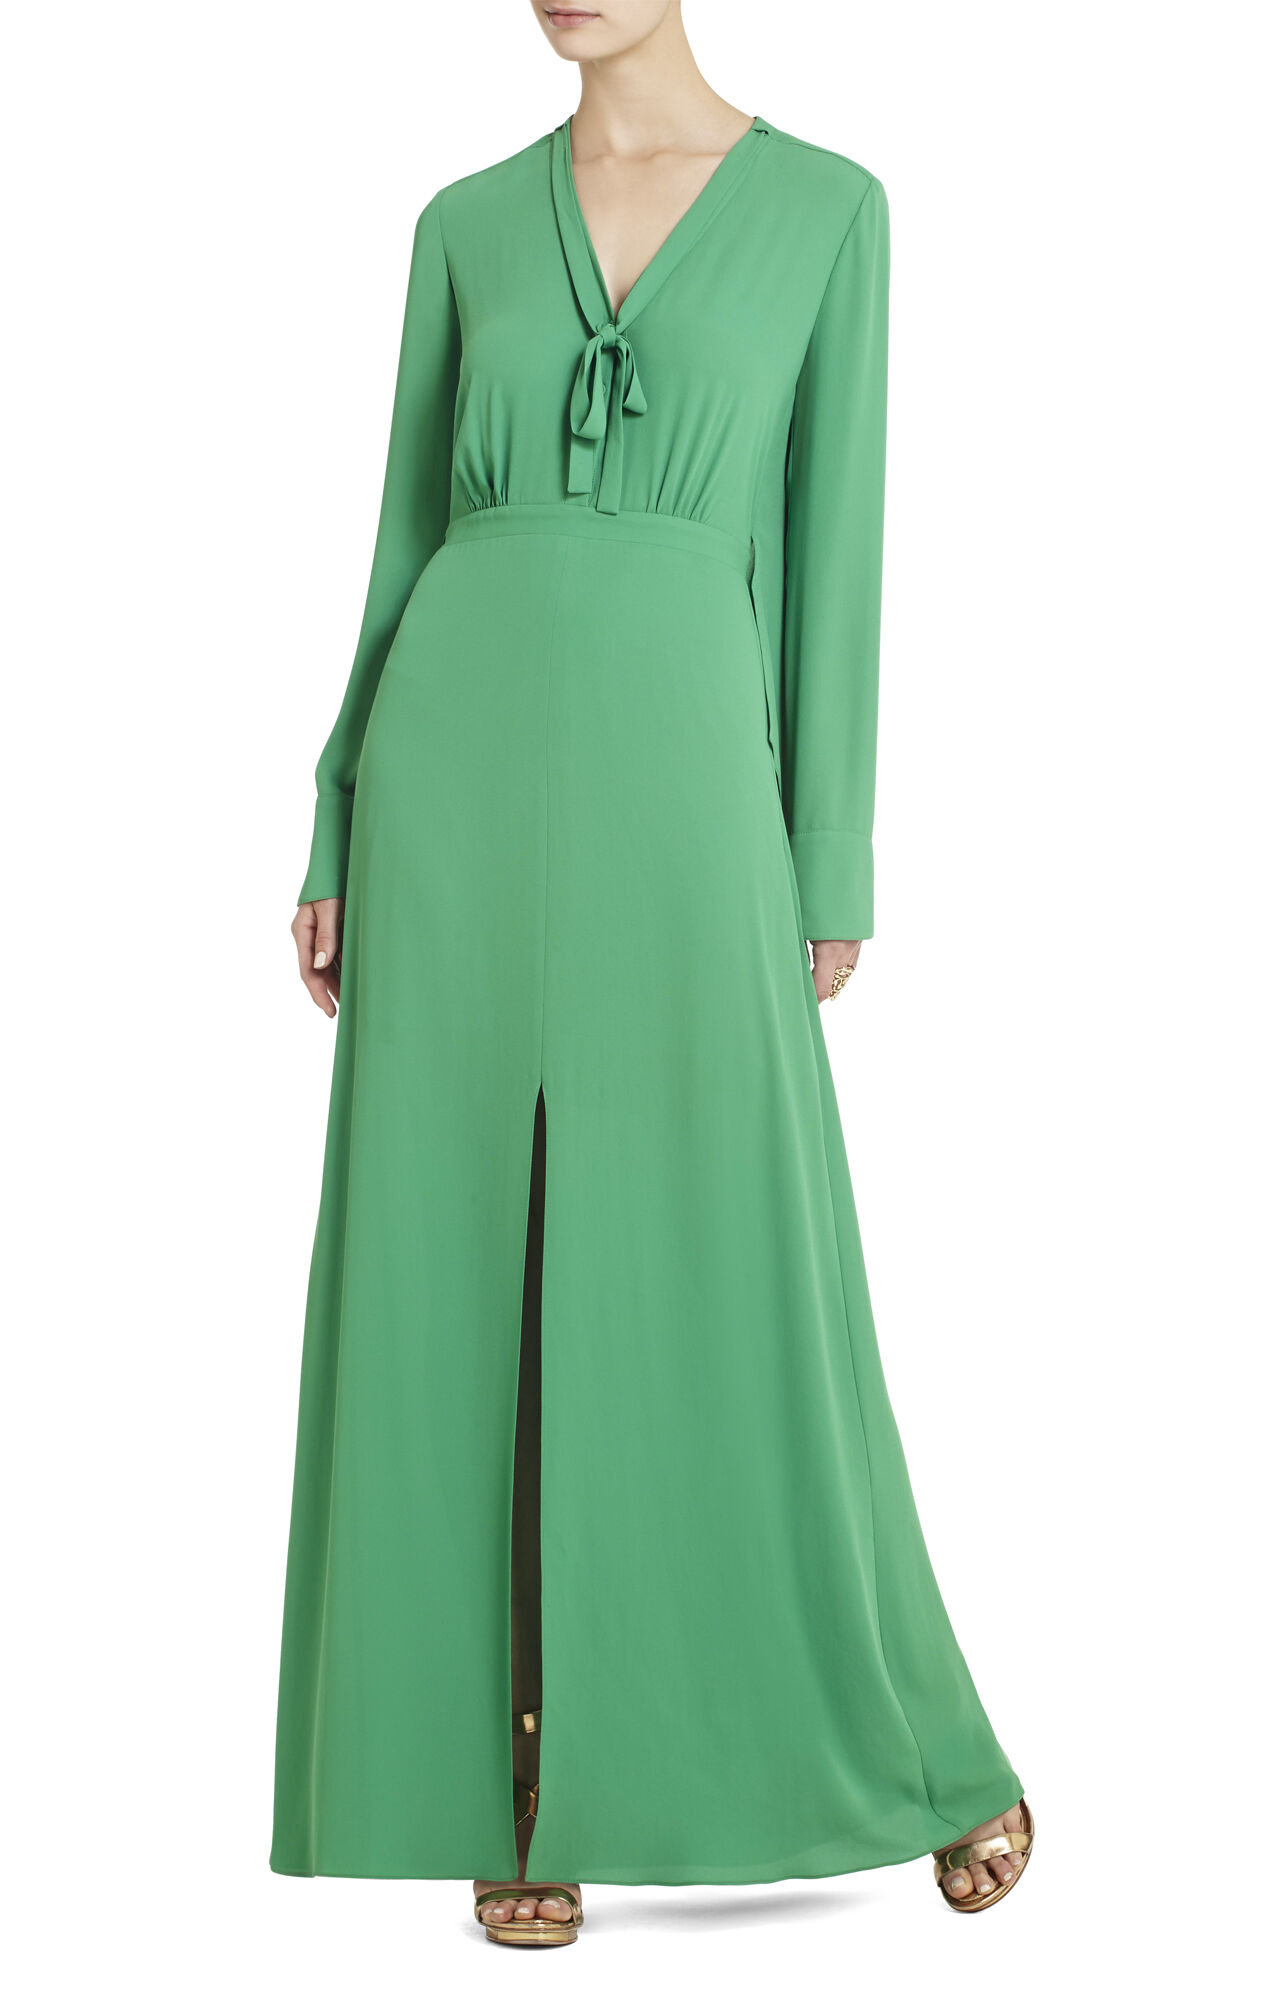 Meredith Long-Sleeve Maxi Dress